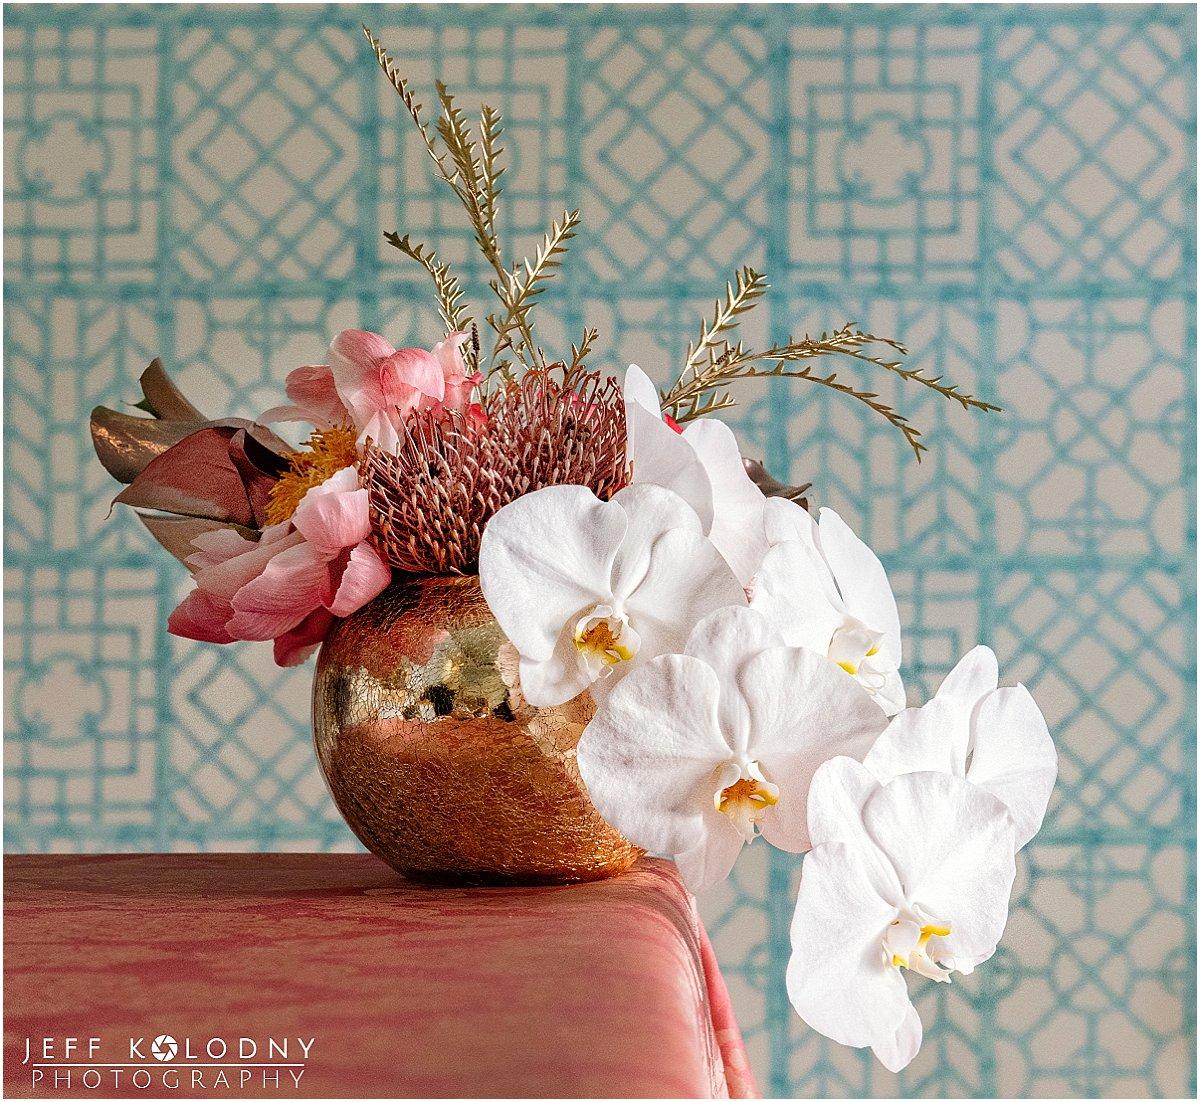 Palm Beach Wedding Ideas_Photo by Jeff Kolodny Photography